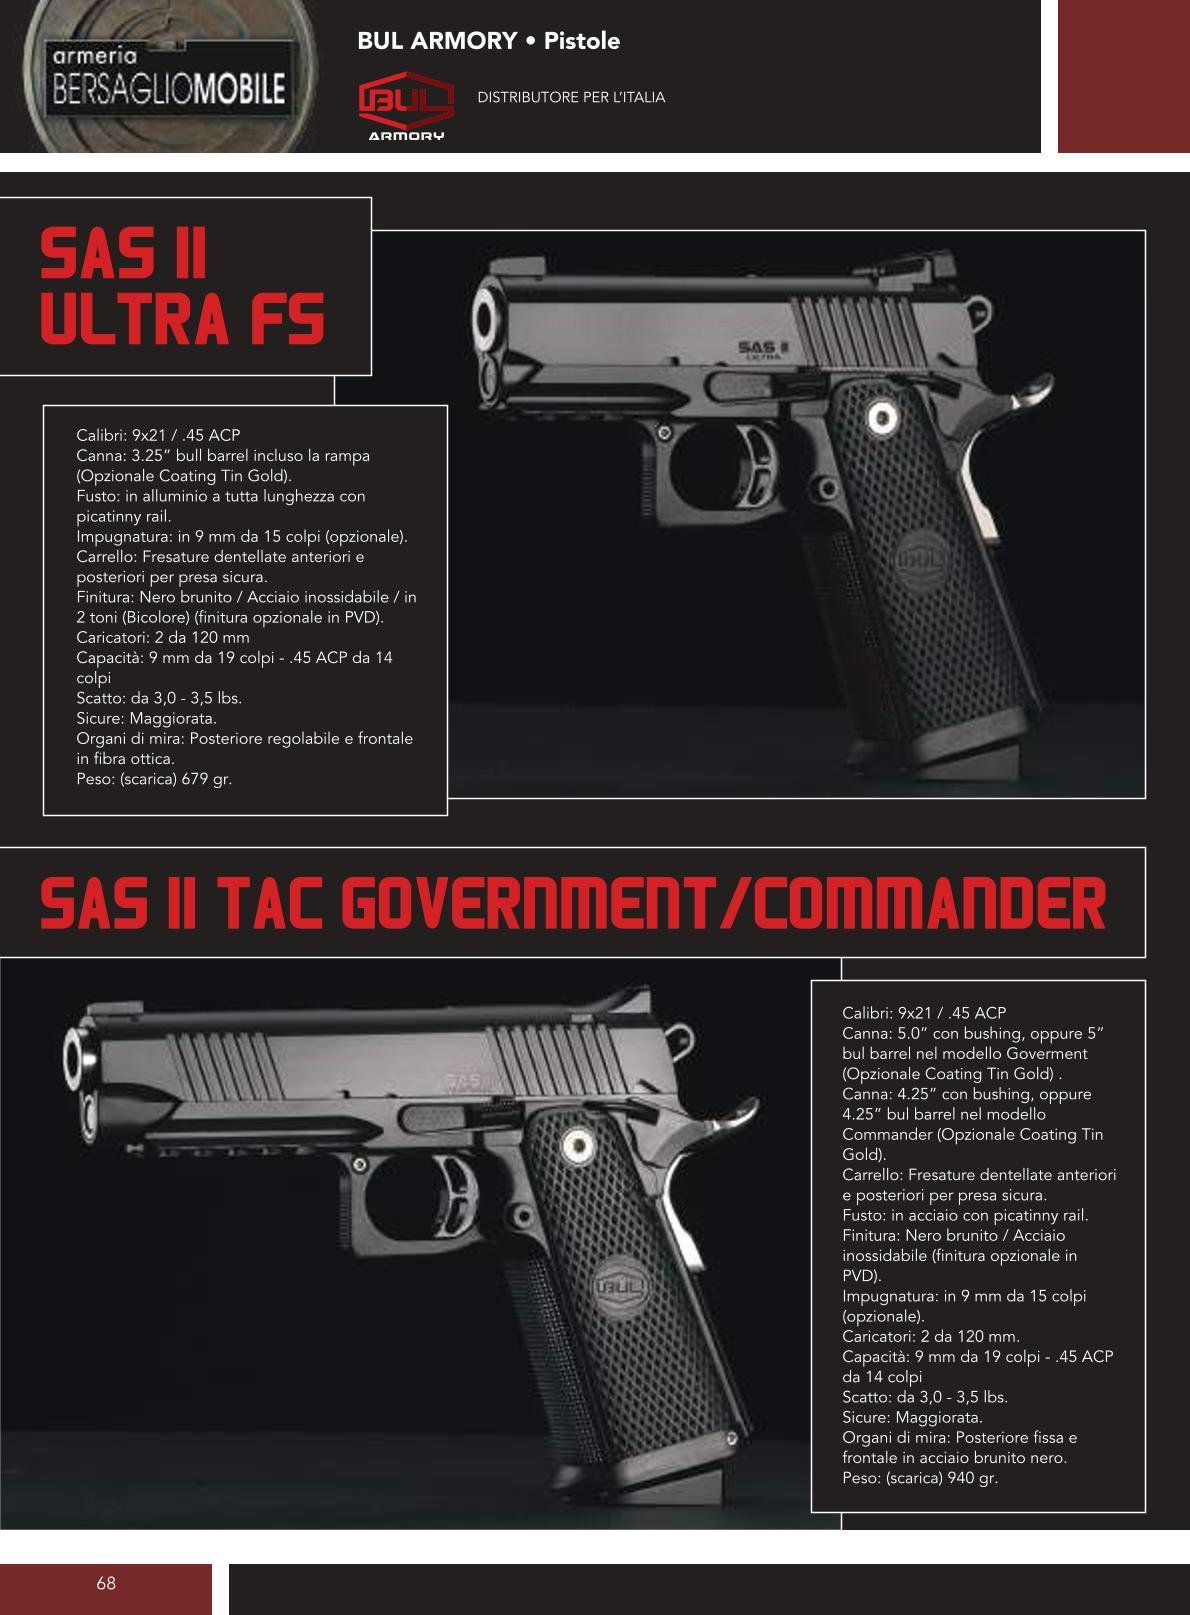 Bul Armory - Sas II Ultra FS - Sas II Tac Government/Commander - Armeria Bersaglio Mobile